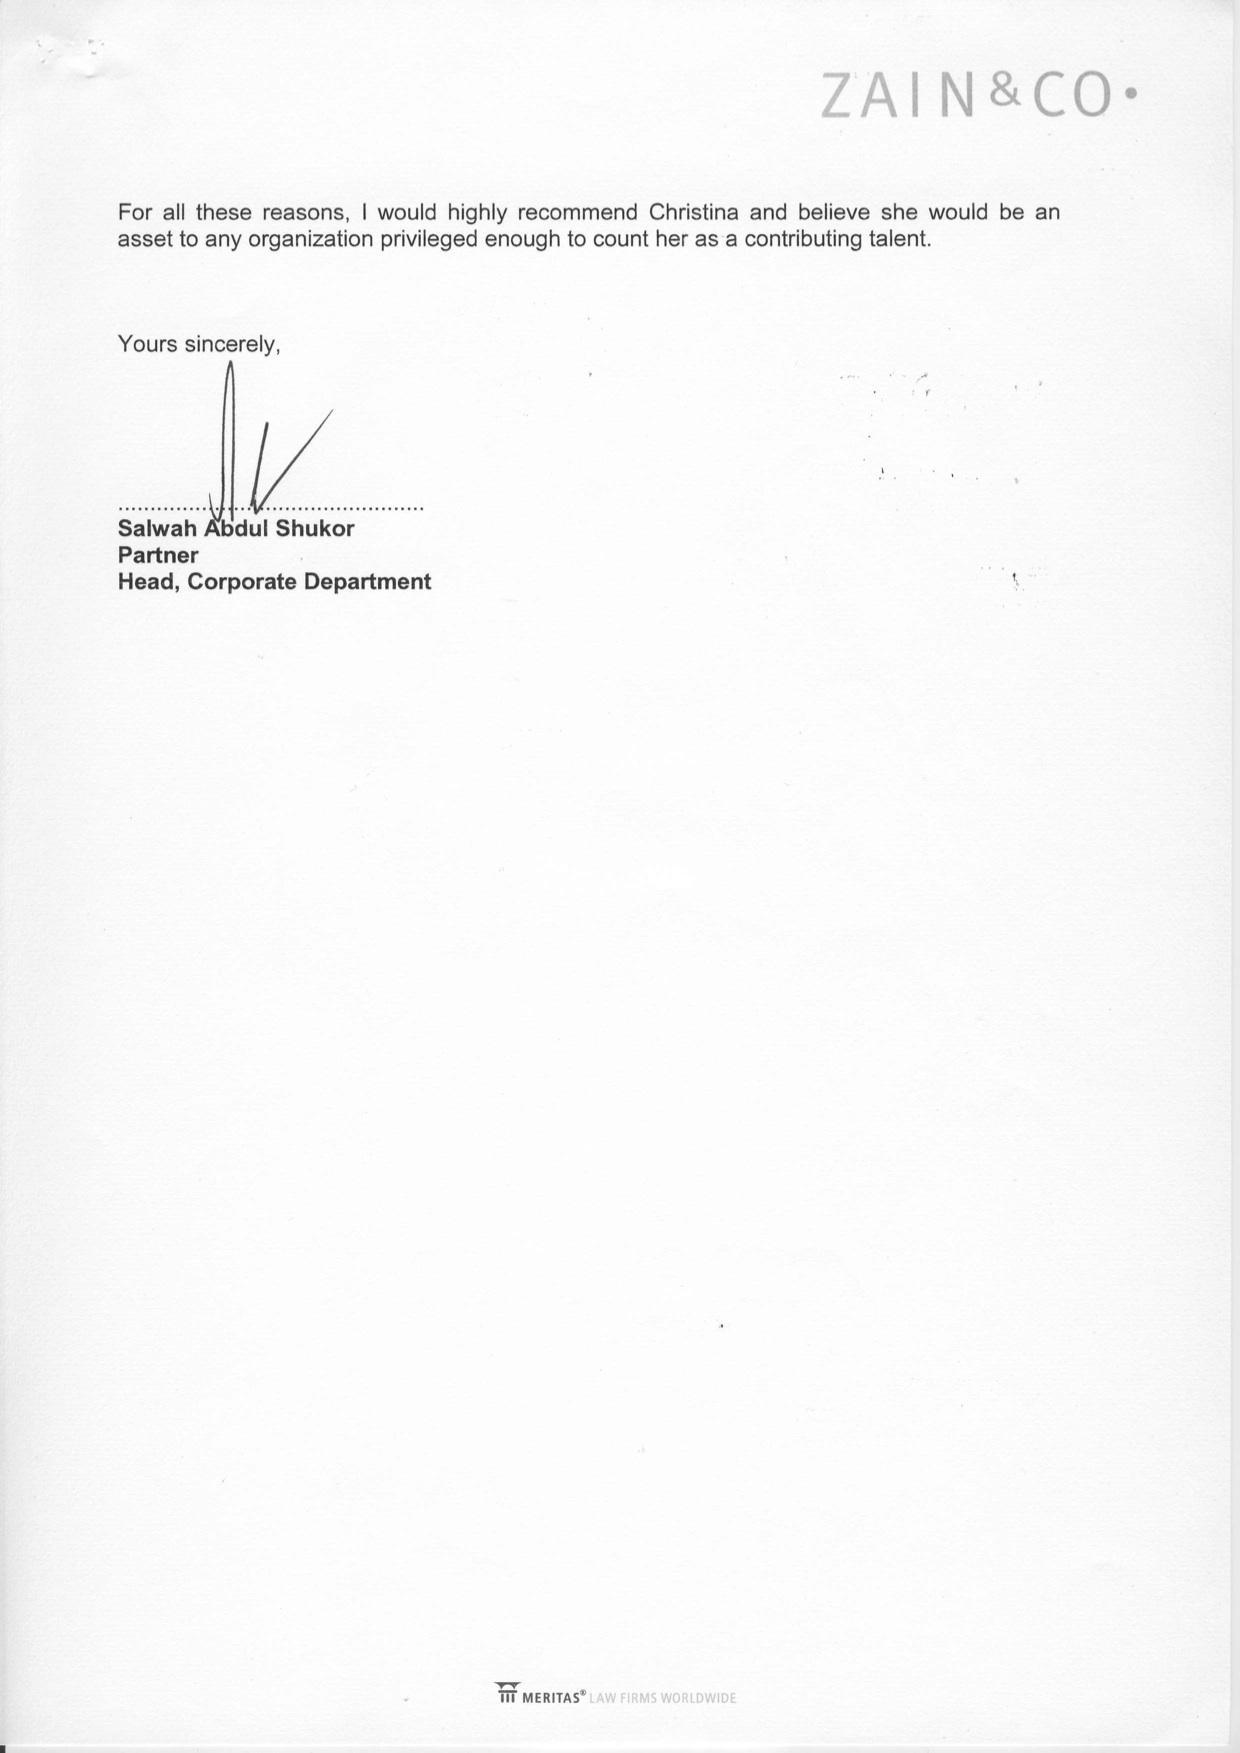 2013 - Legal - Zain & Co - Reference Letter p.2.jpg